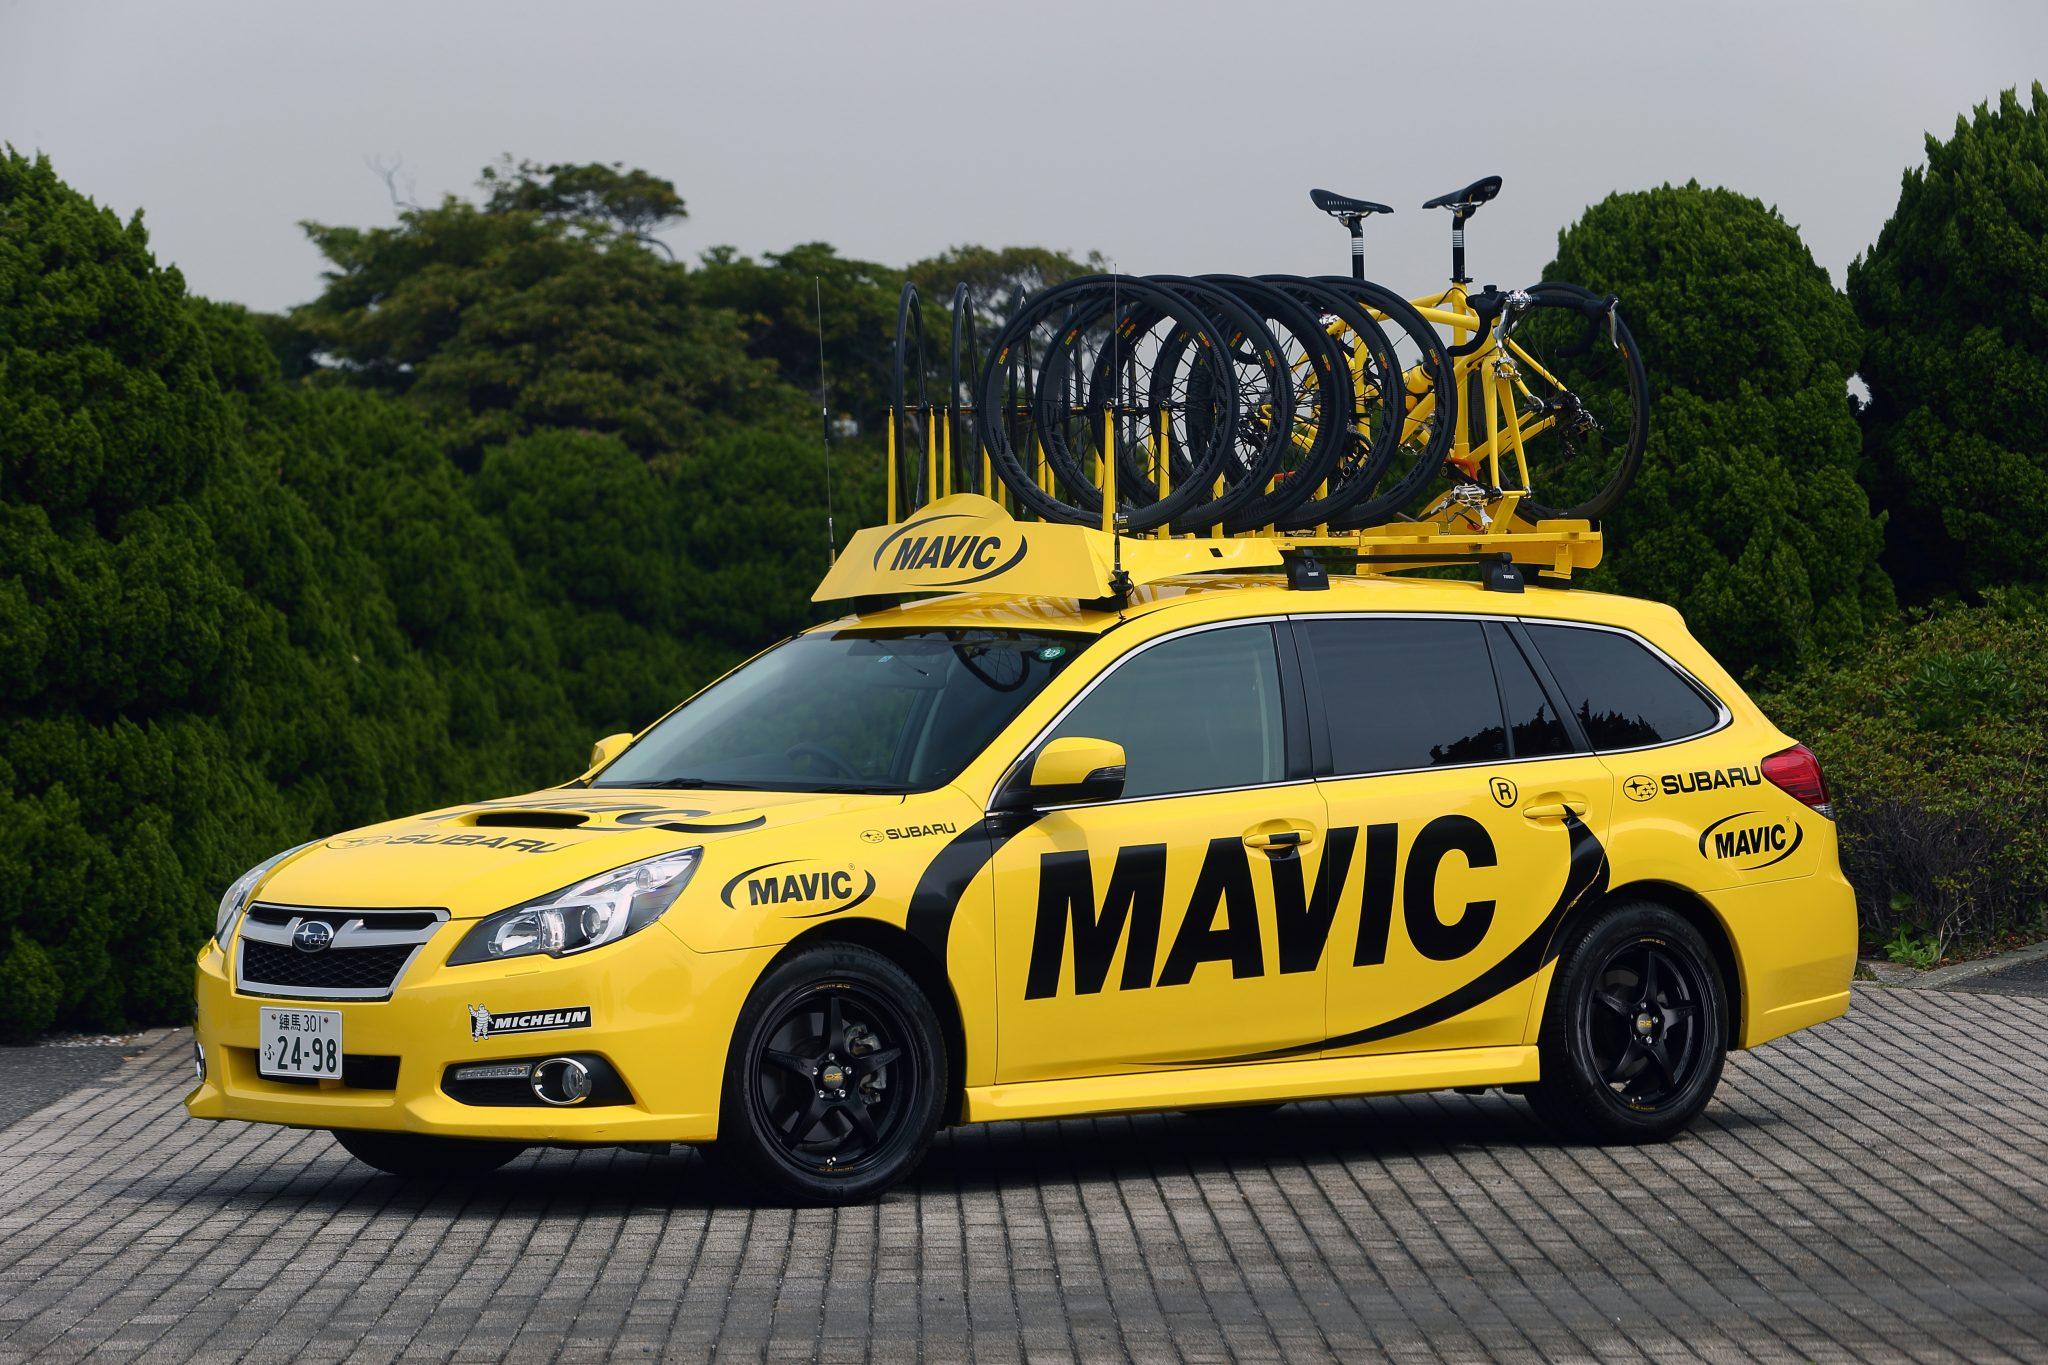 MAVIC CAR